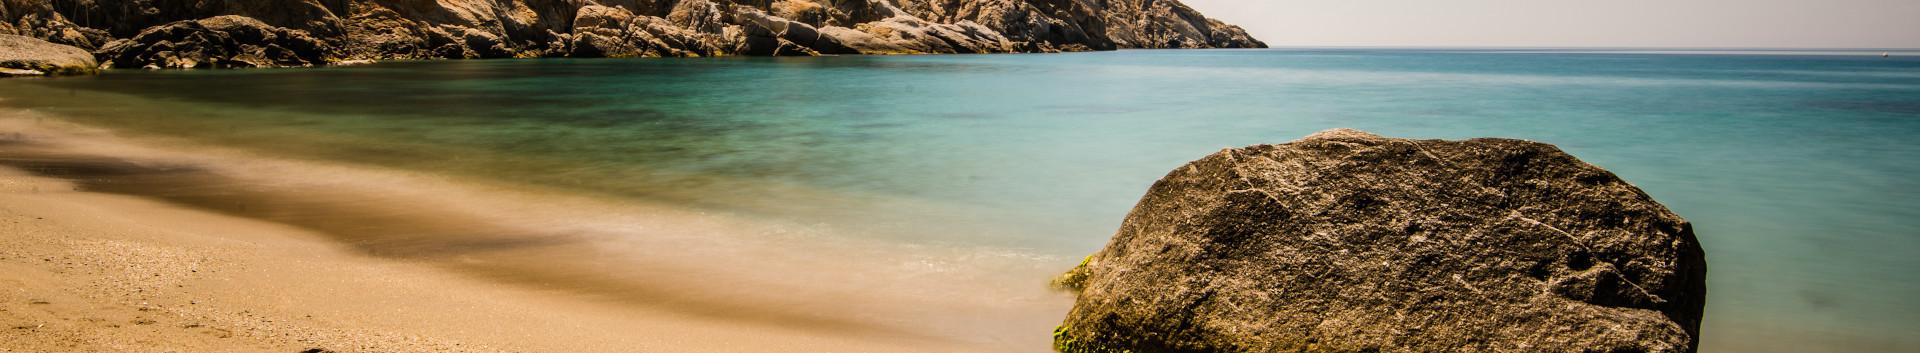 Mare dell'isola d'elba